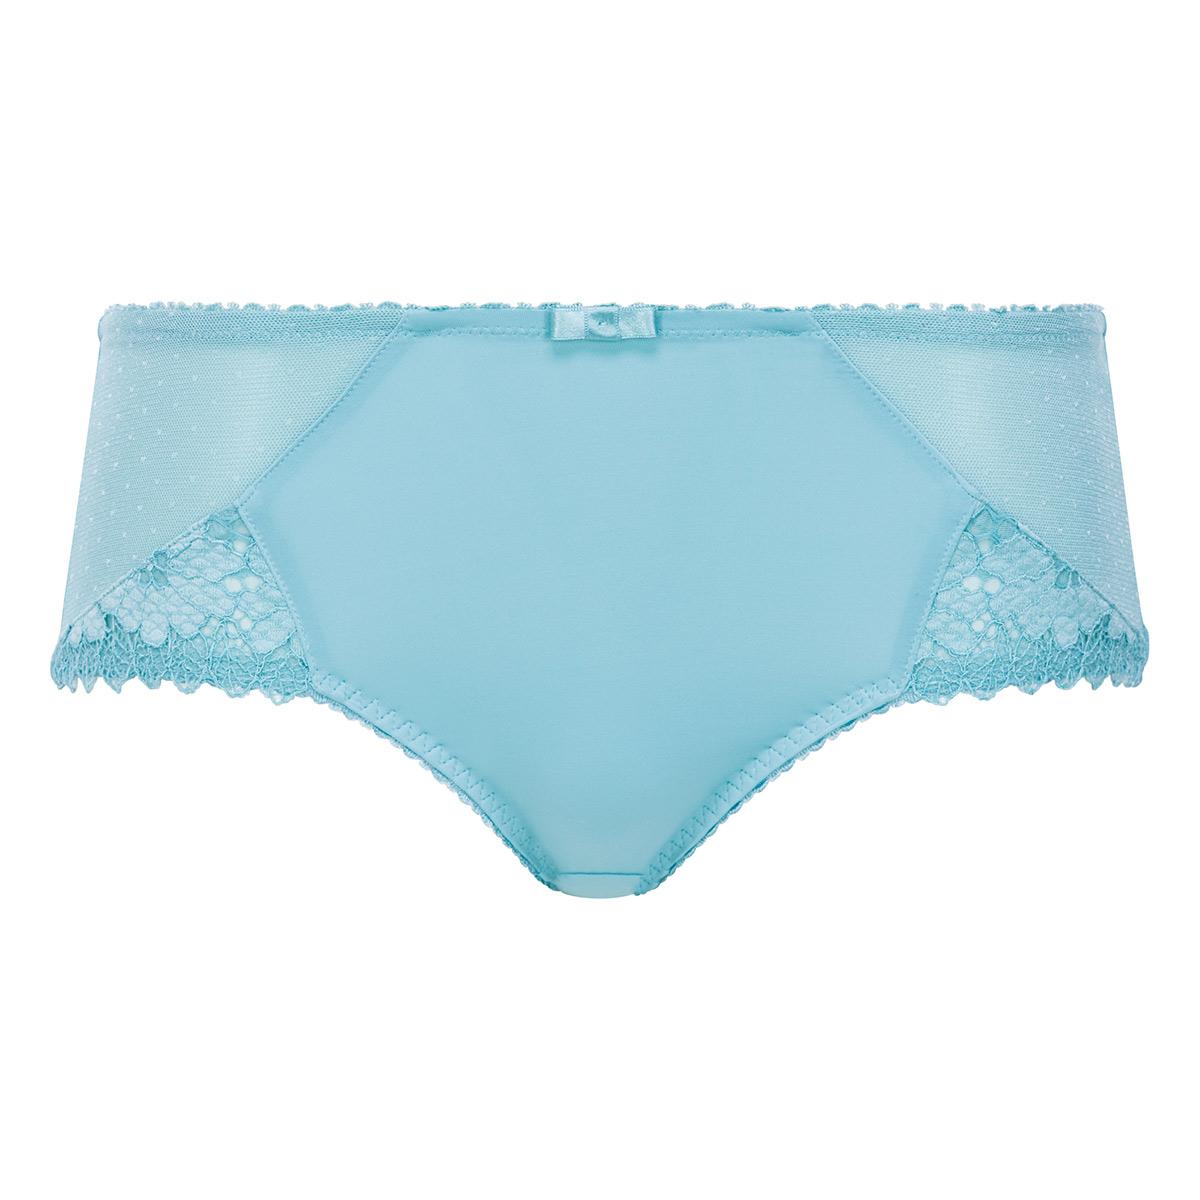 Slip Midi in pizzo blu laguna - Criss Cross Femminile - PLAYTEX